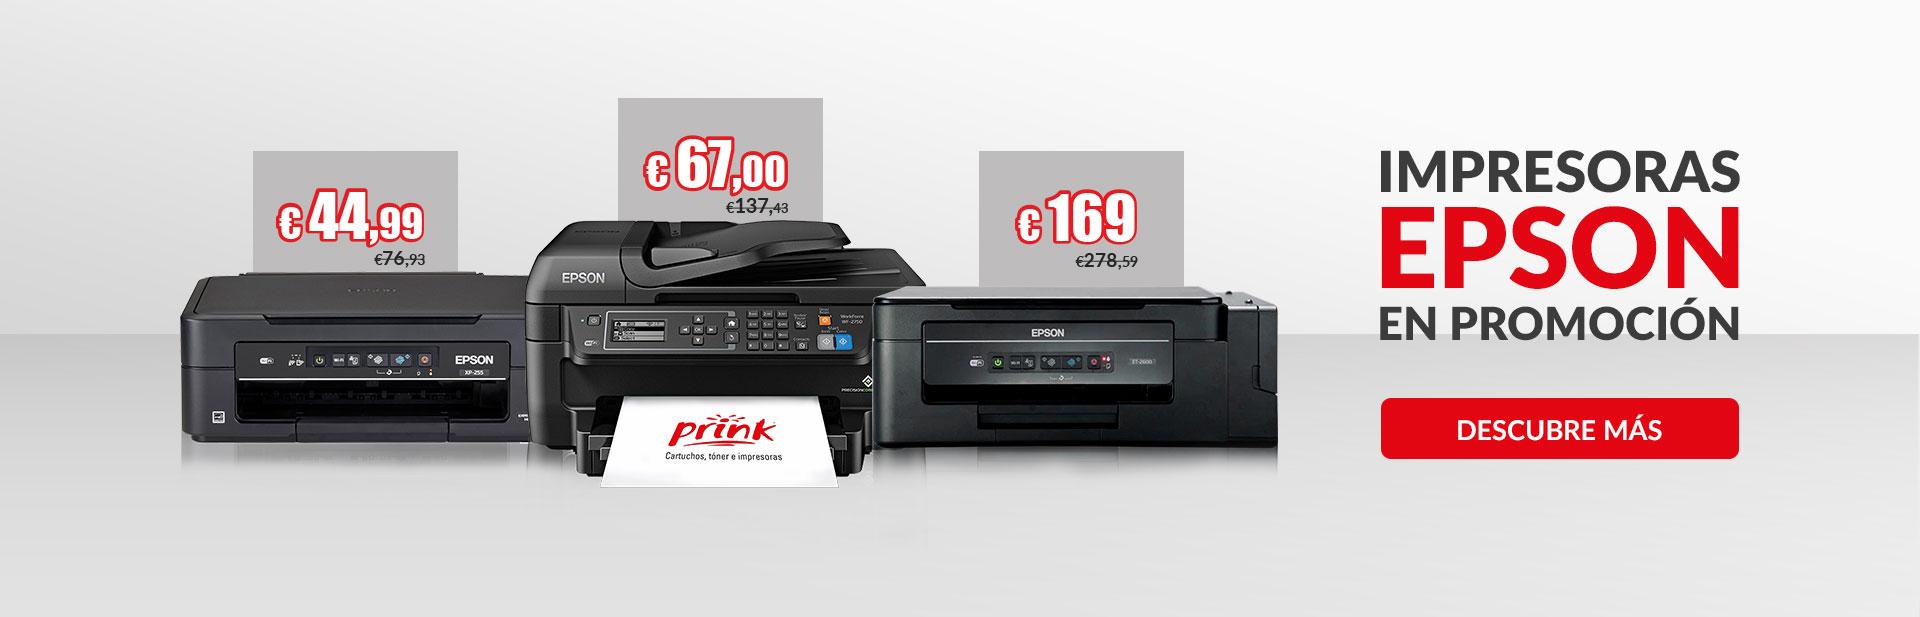 slider-Homepage-promo-epson-impresoras